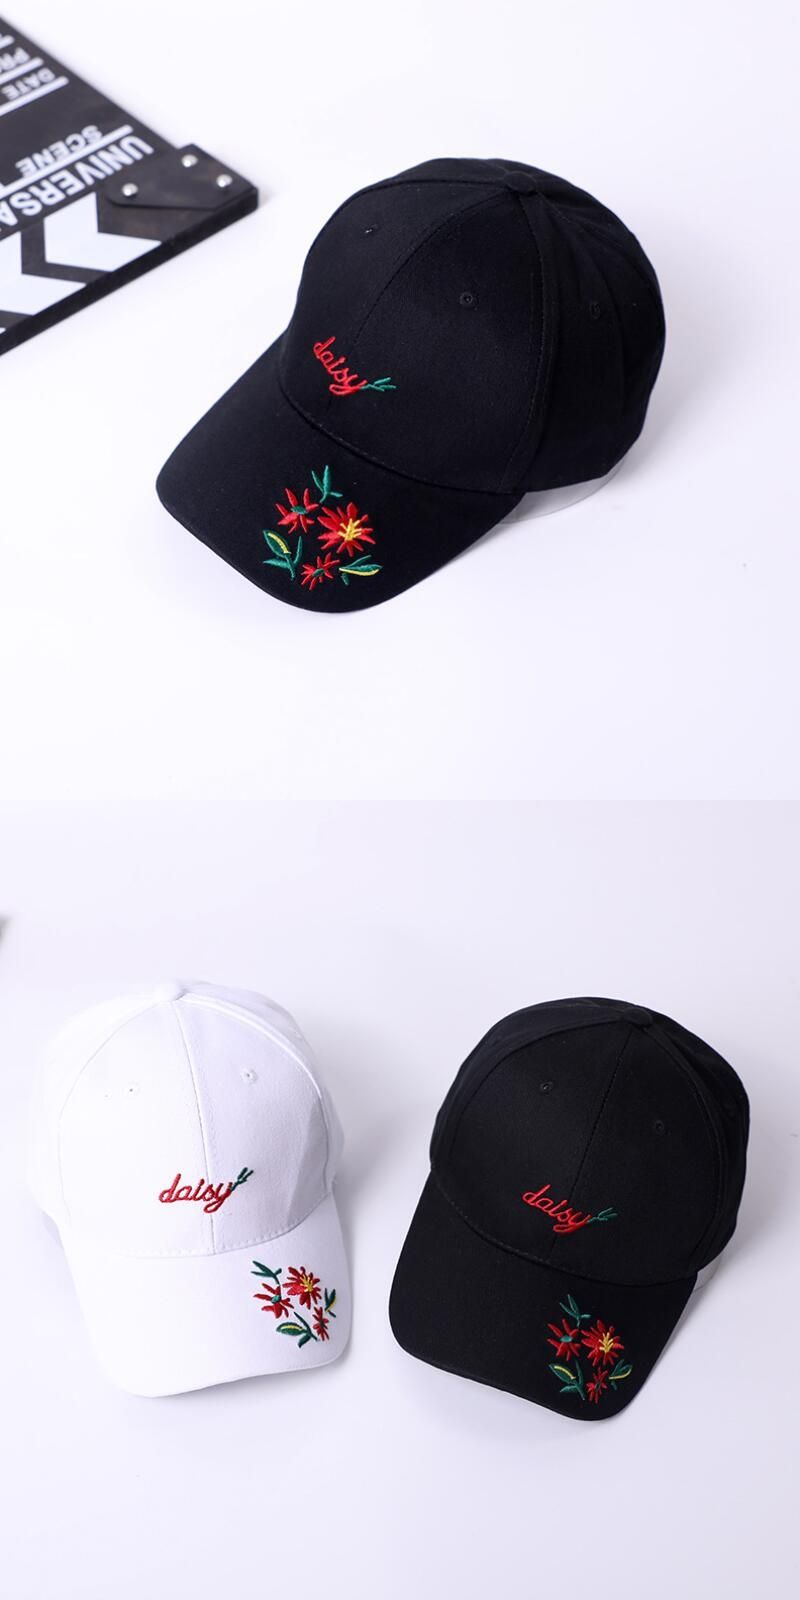 31fc91b9999 Unisex Snapback Baseball Cap Dad Hats Woman Cap Man Baseball Hat Snapbacks  Rose Golf Polo Adjustable